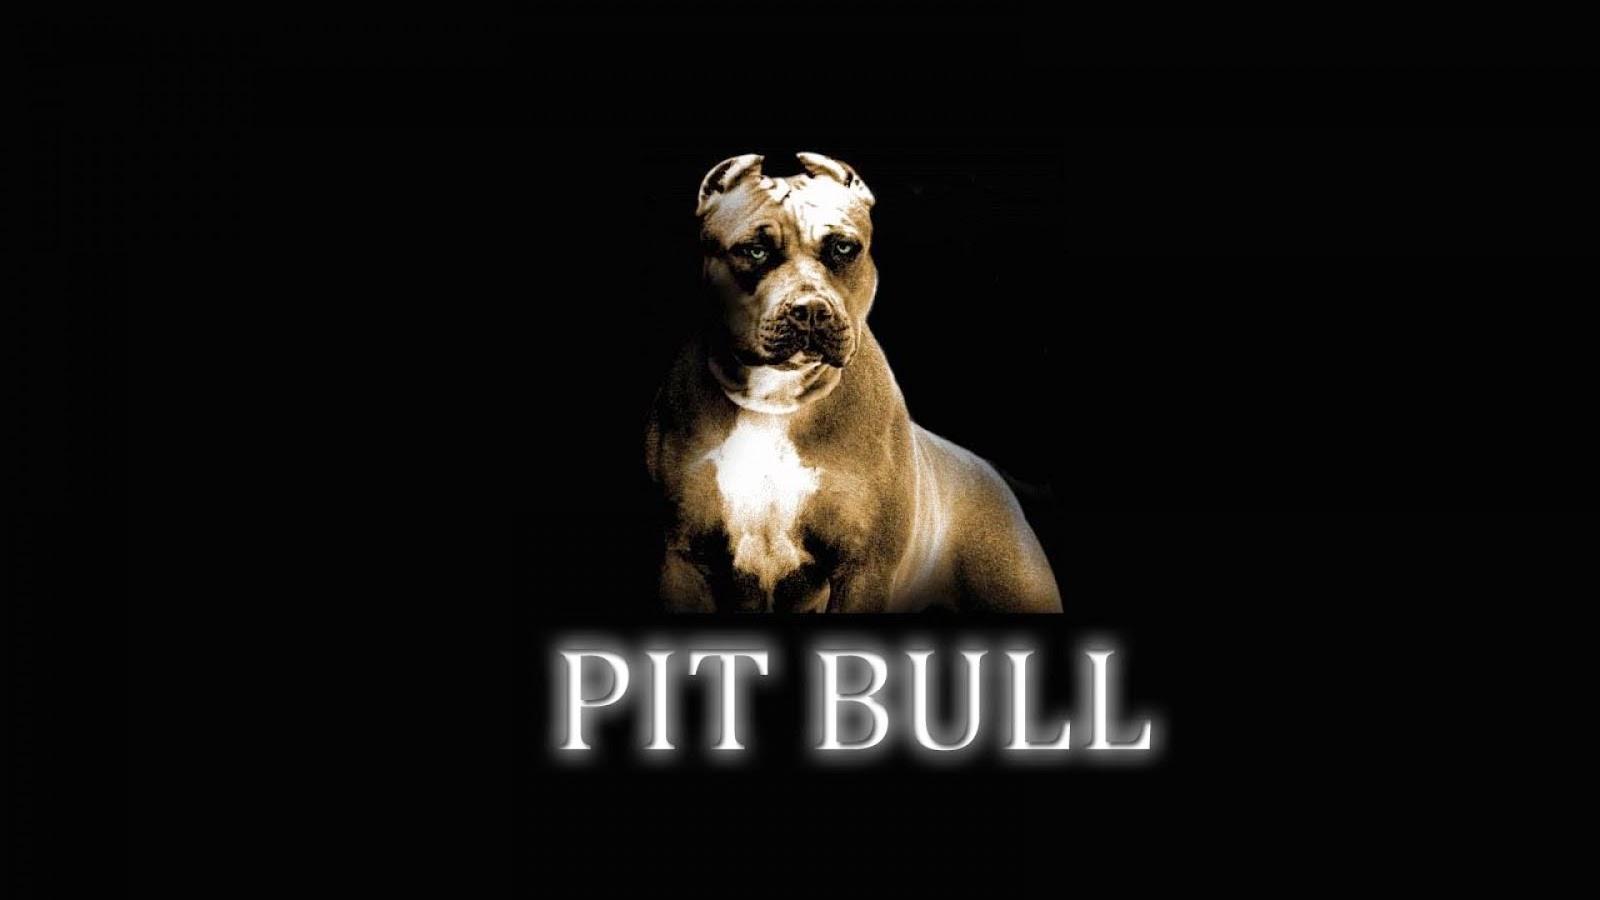 pitbull dog hd wallpaper free download